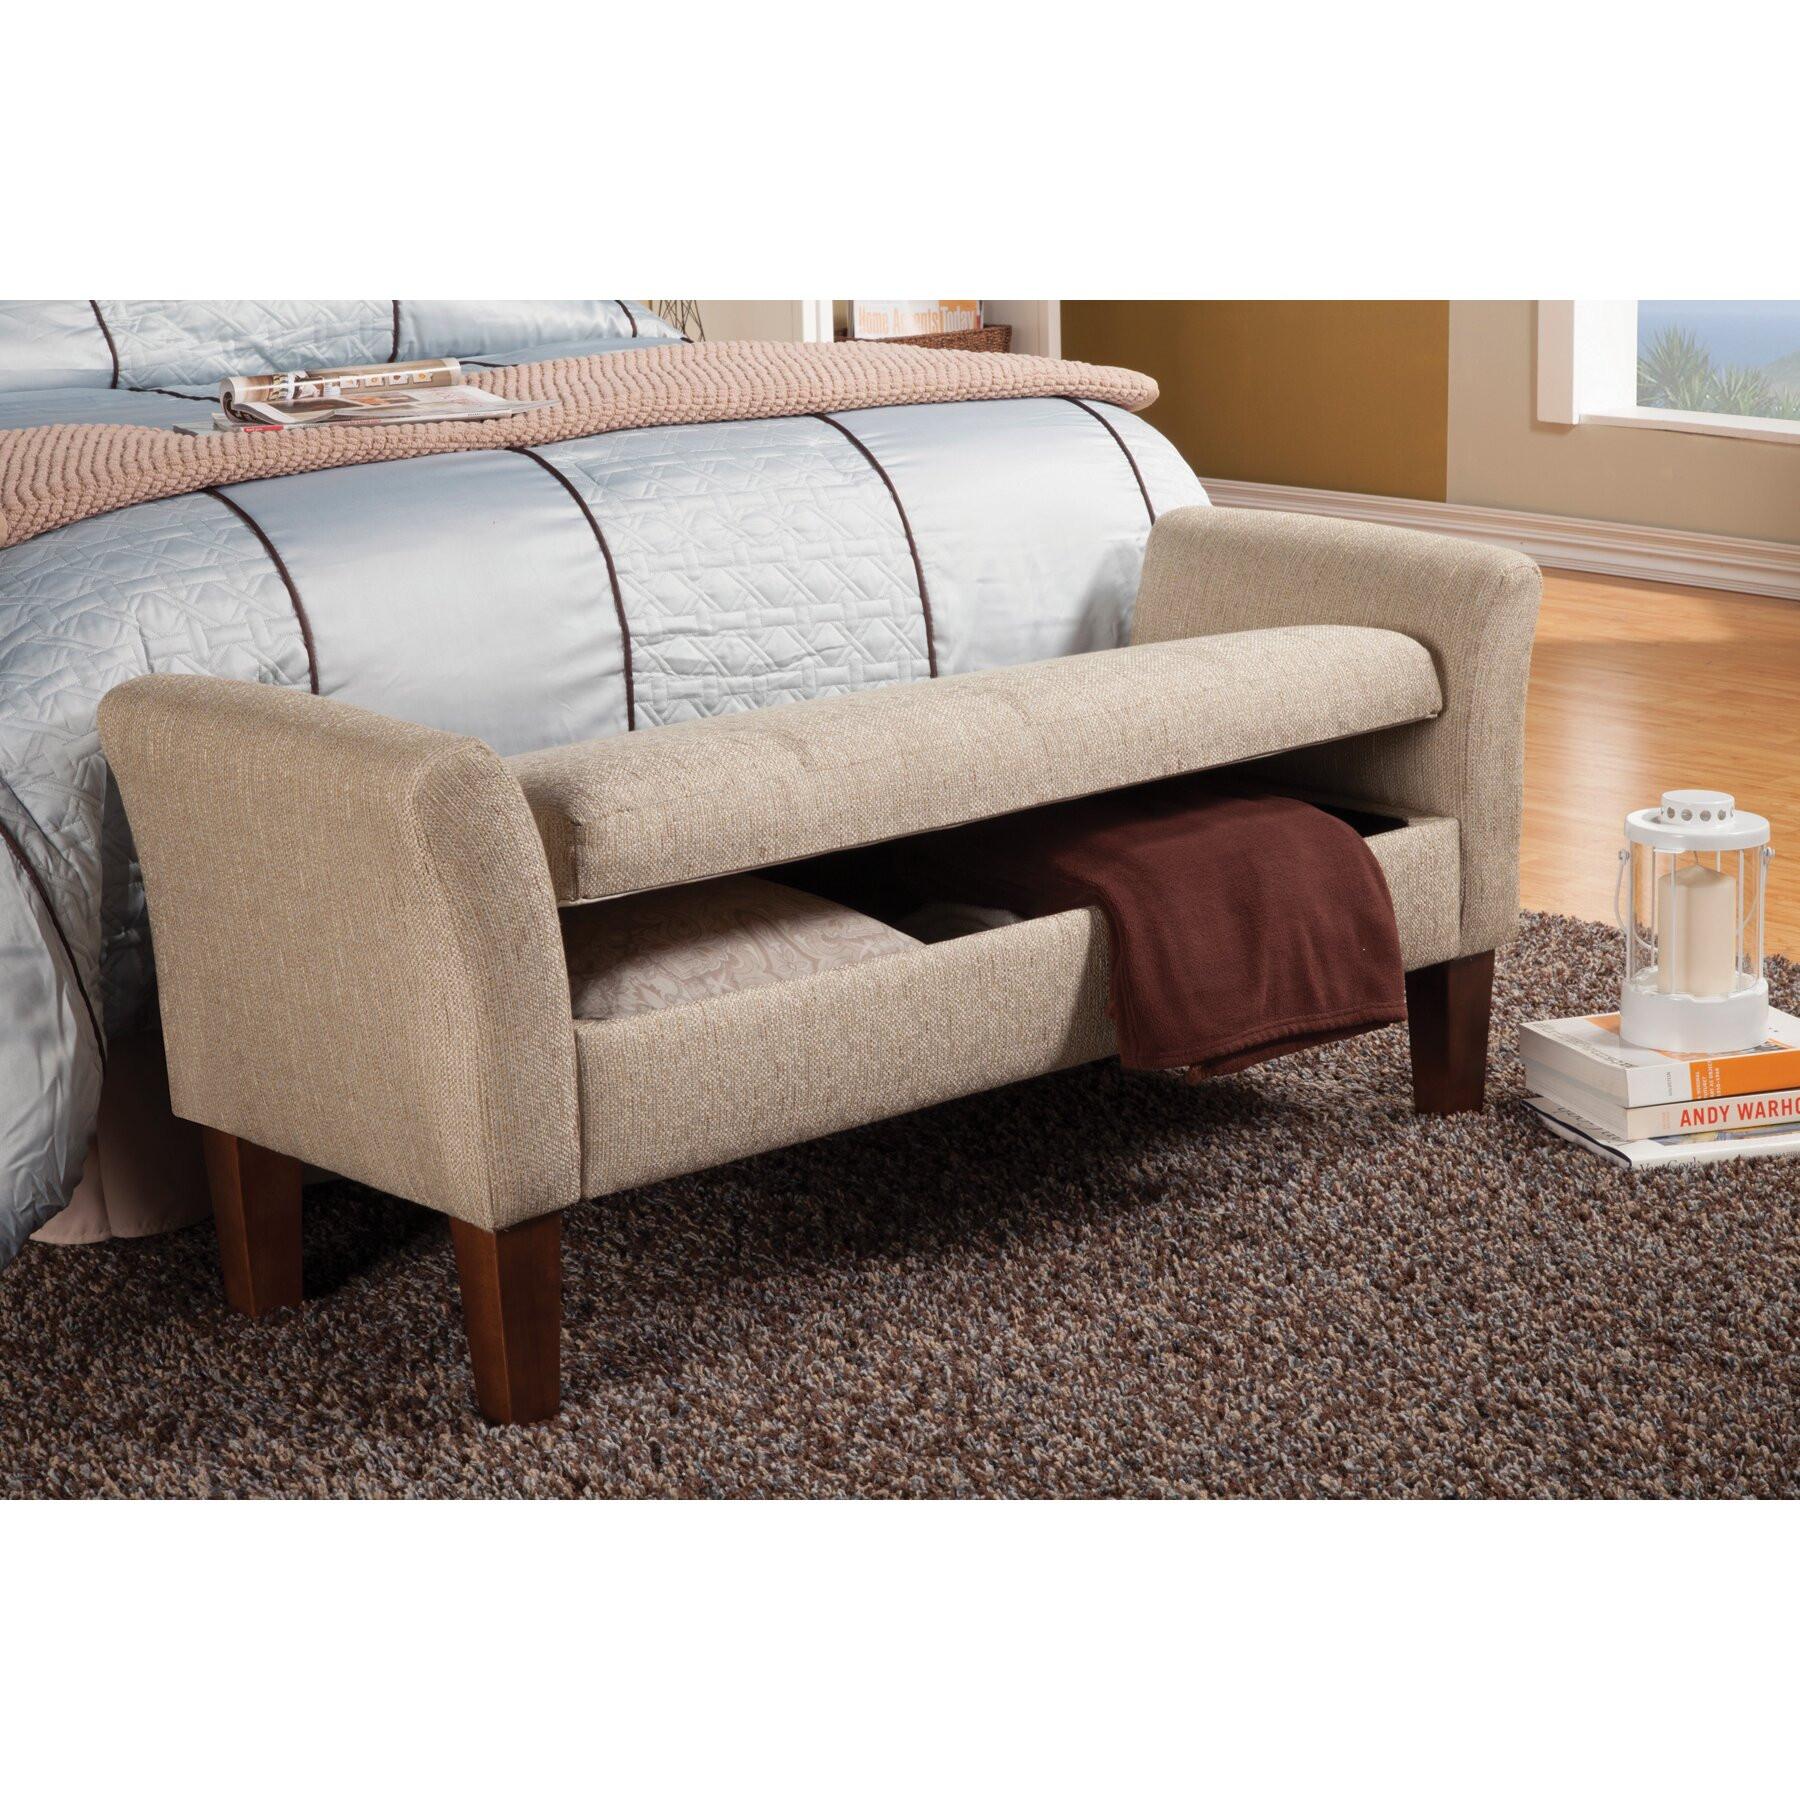 Storage Bench Bedroom  Wildon Home Upholstered Storage Bedroom Bench & Reviews